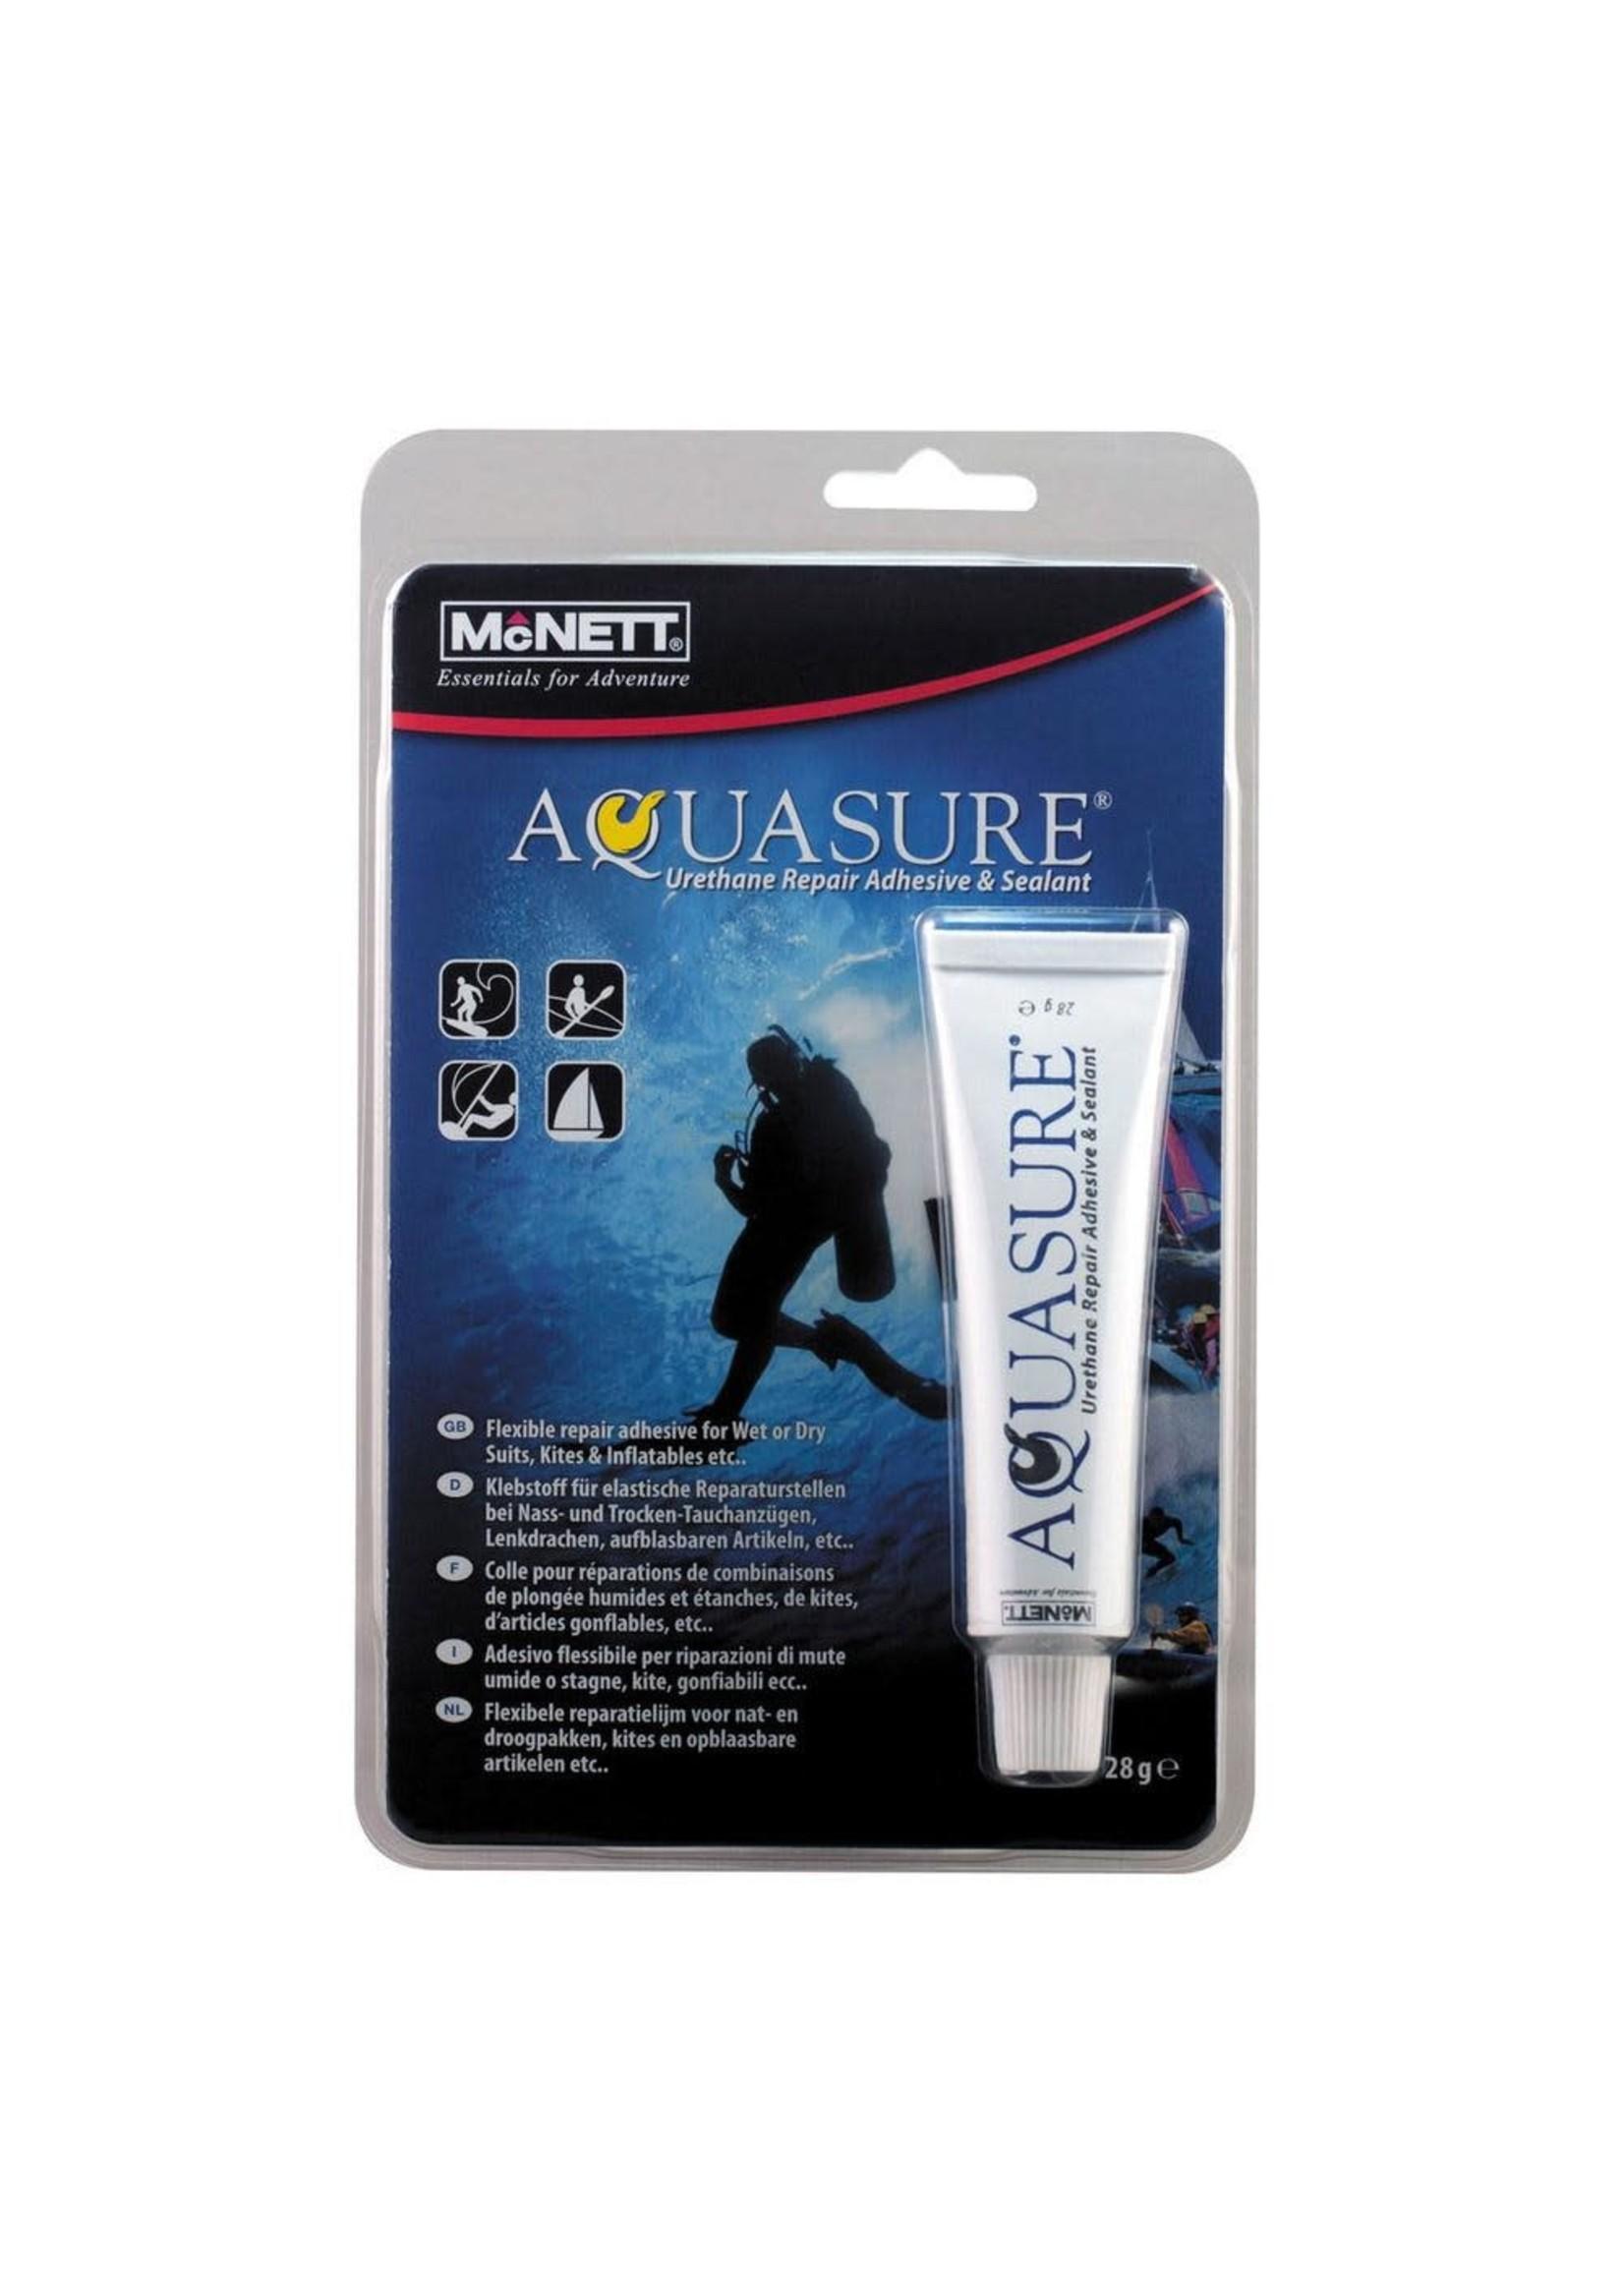 McNett-GearAid McNett-GearAid Aquasure